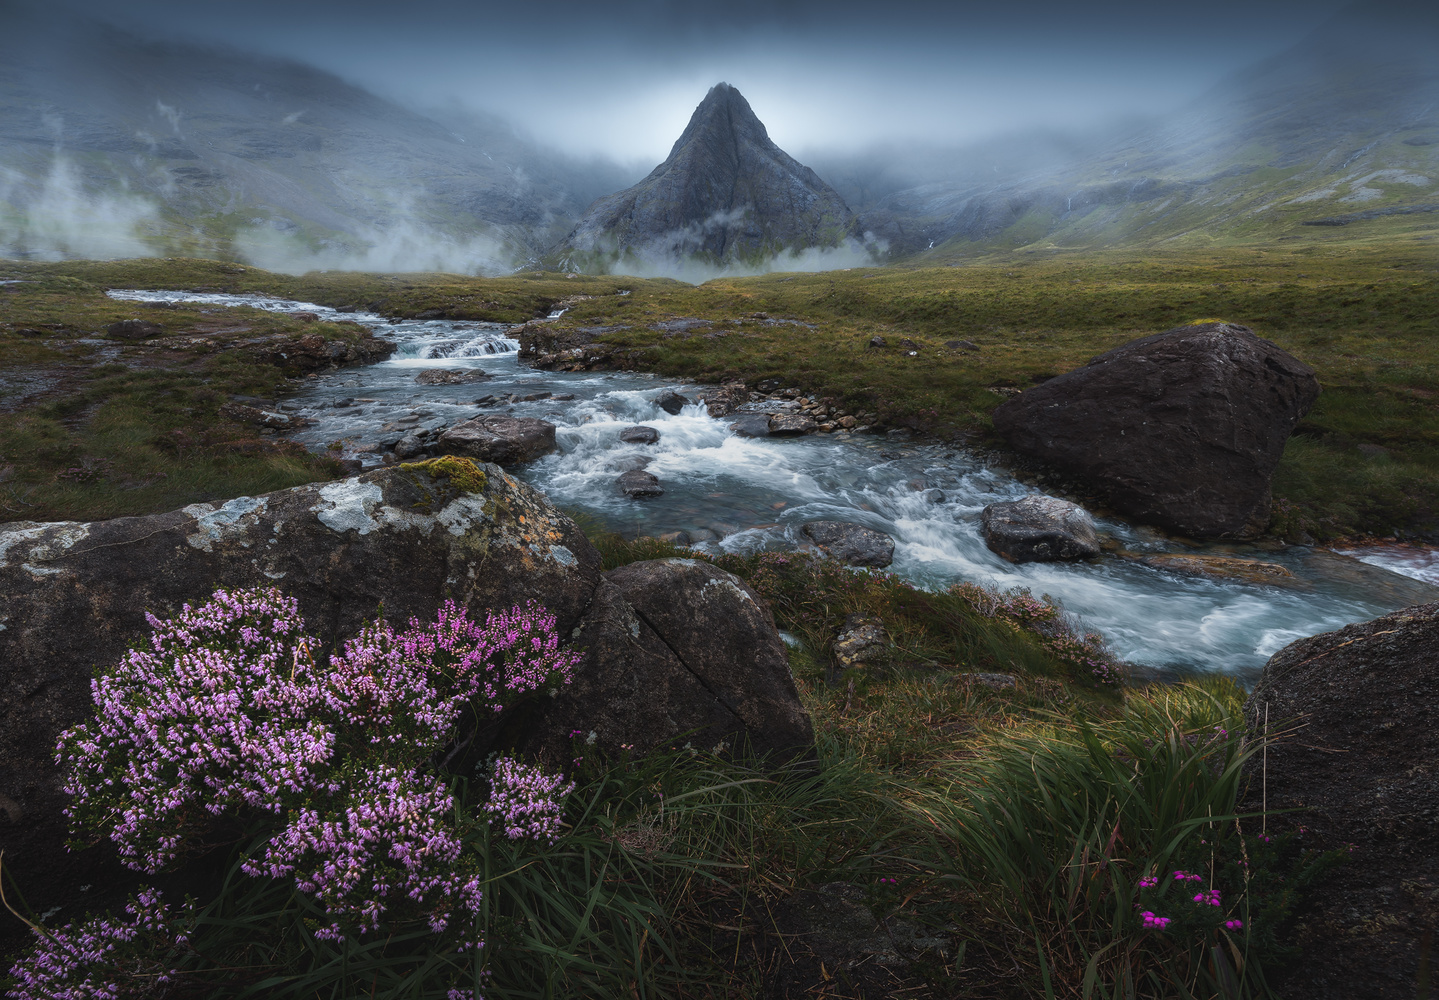 FairyFlow by Alessandro Cerro